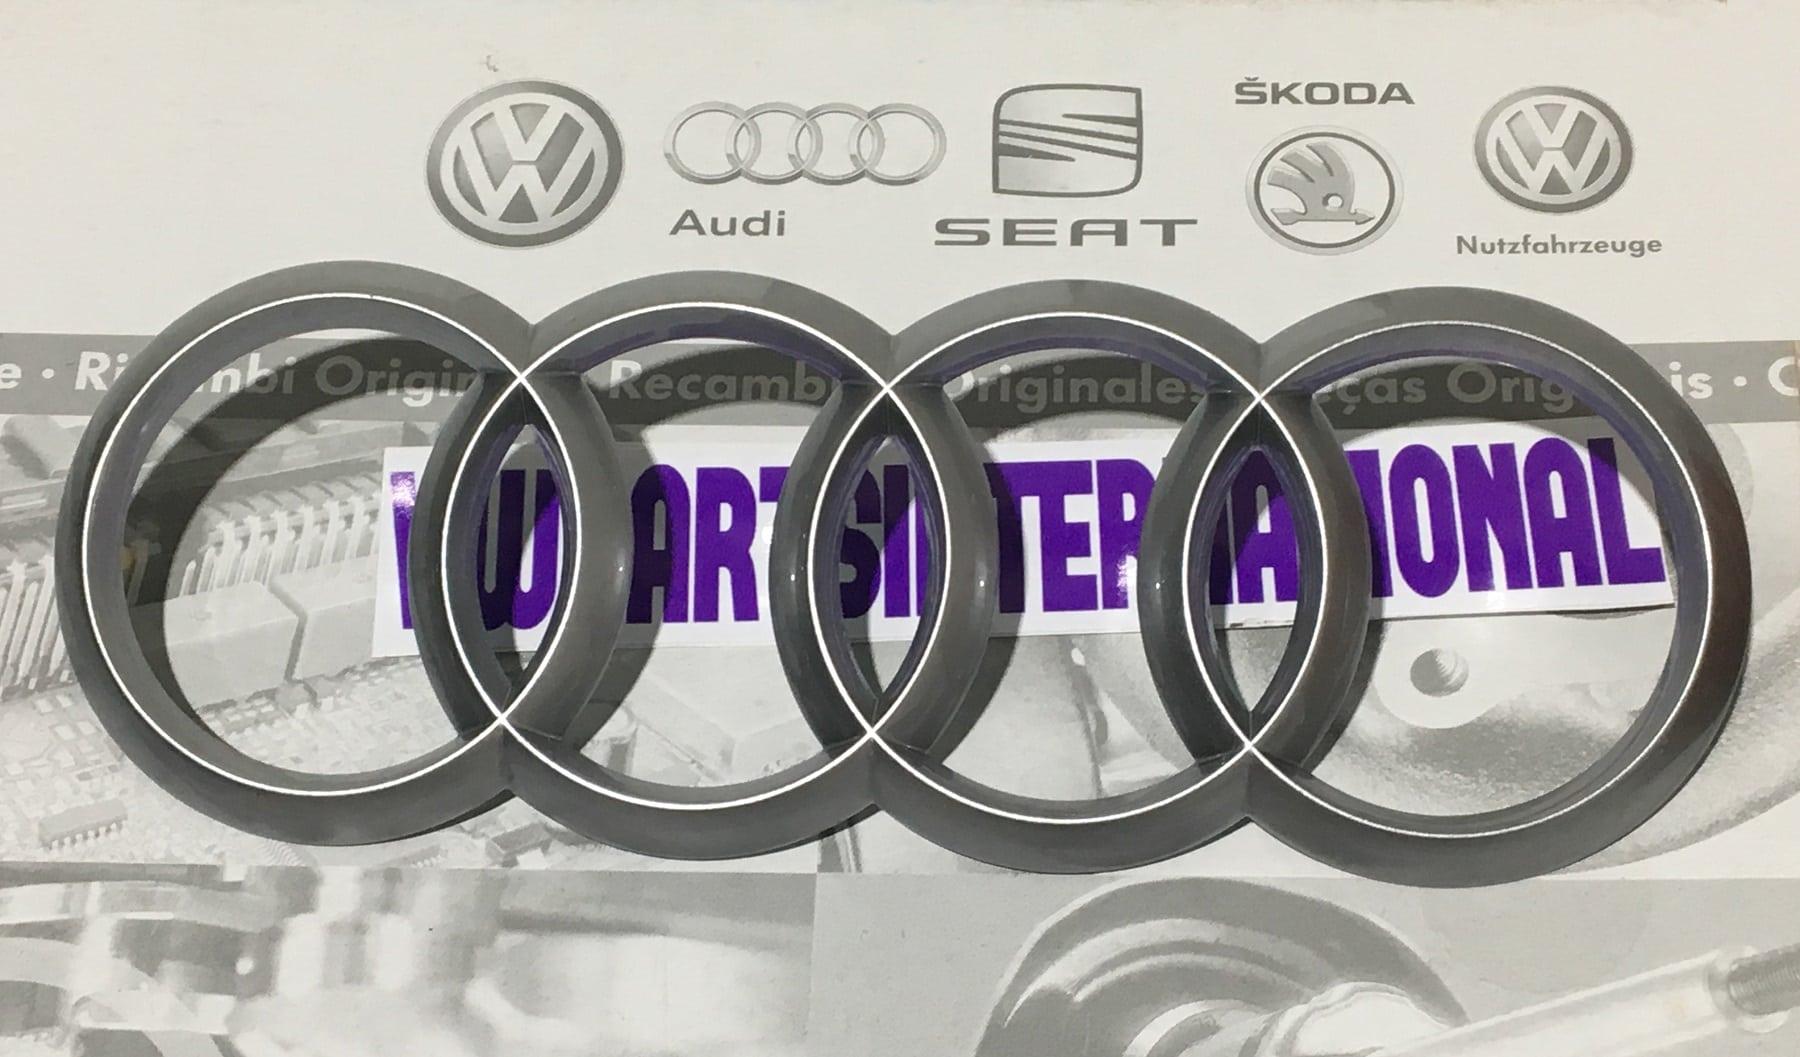 Audi TT MK2 3.2 Engine Logo Audi Badge Detail Inscription New Genuine OEM Audi Part